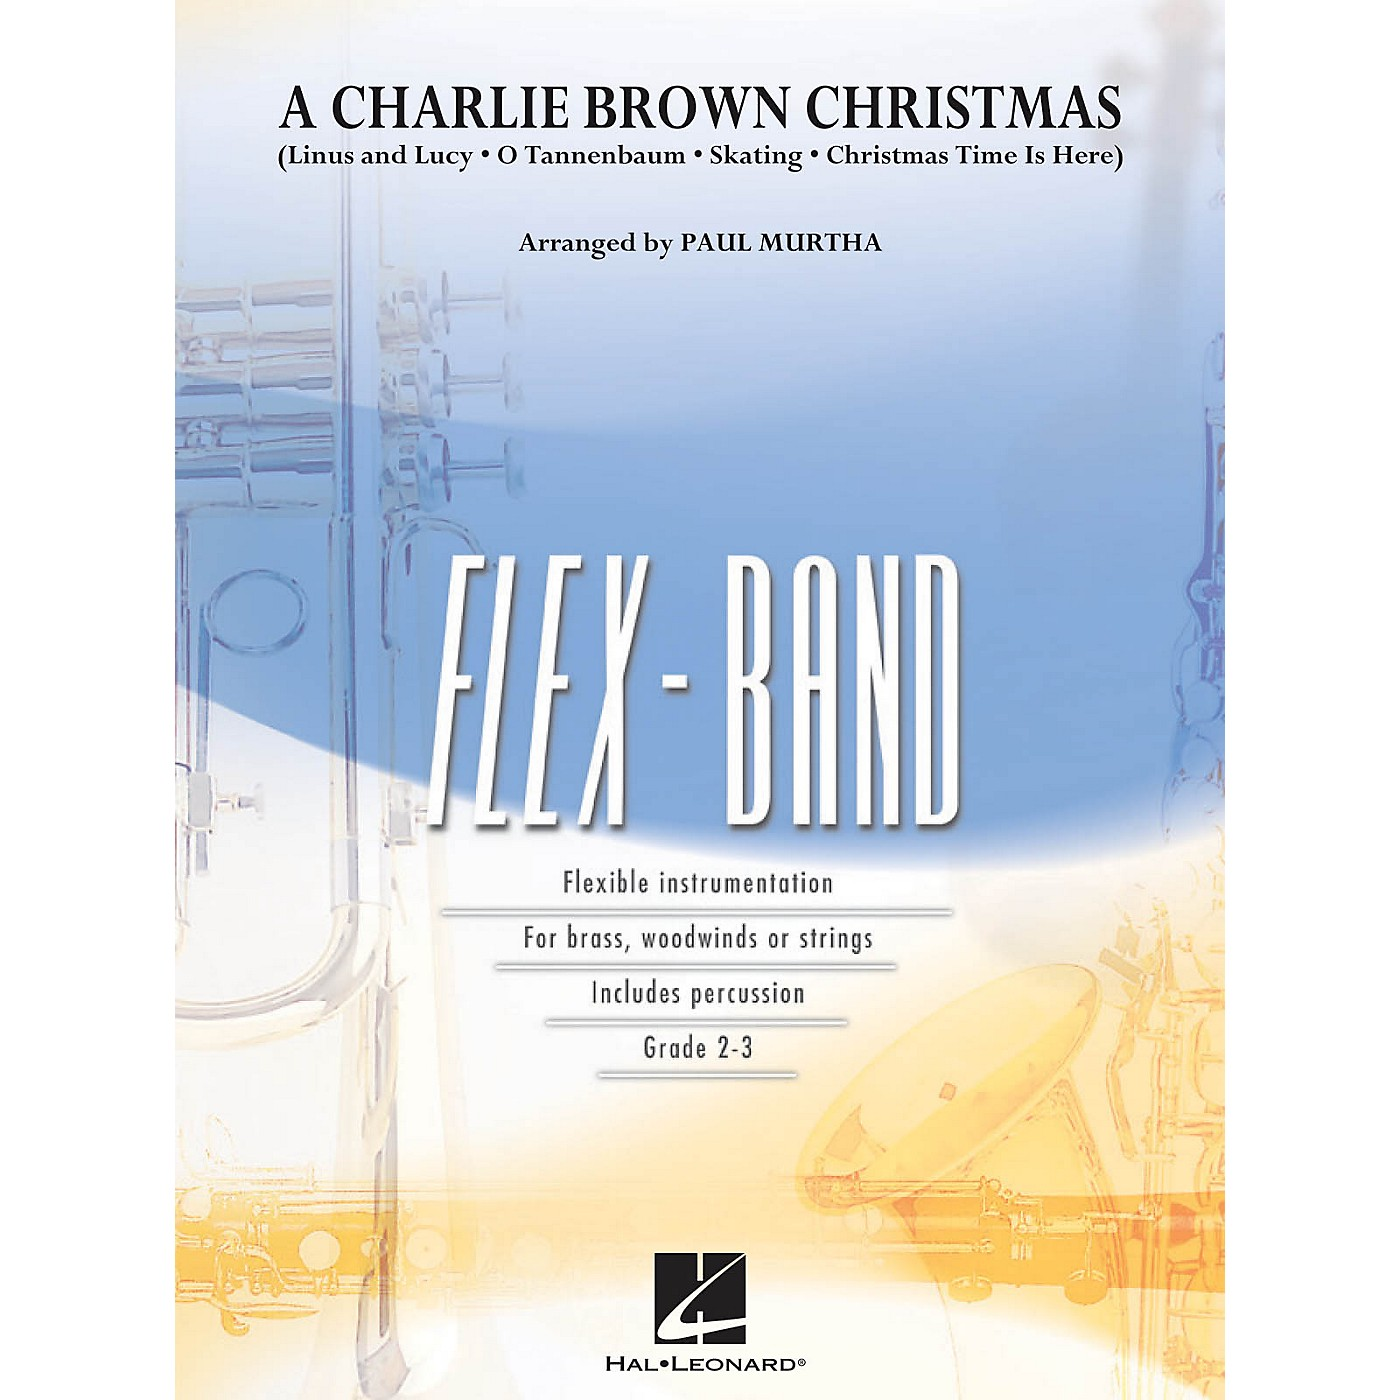 Hal Leonard A Charlie Brown Christmas Concert Band Level 2-3 Arranged by Paul Murtha thumbnail